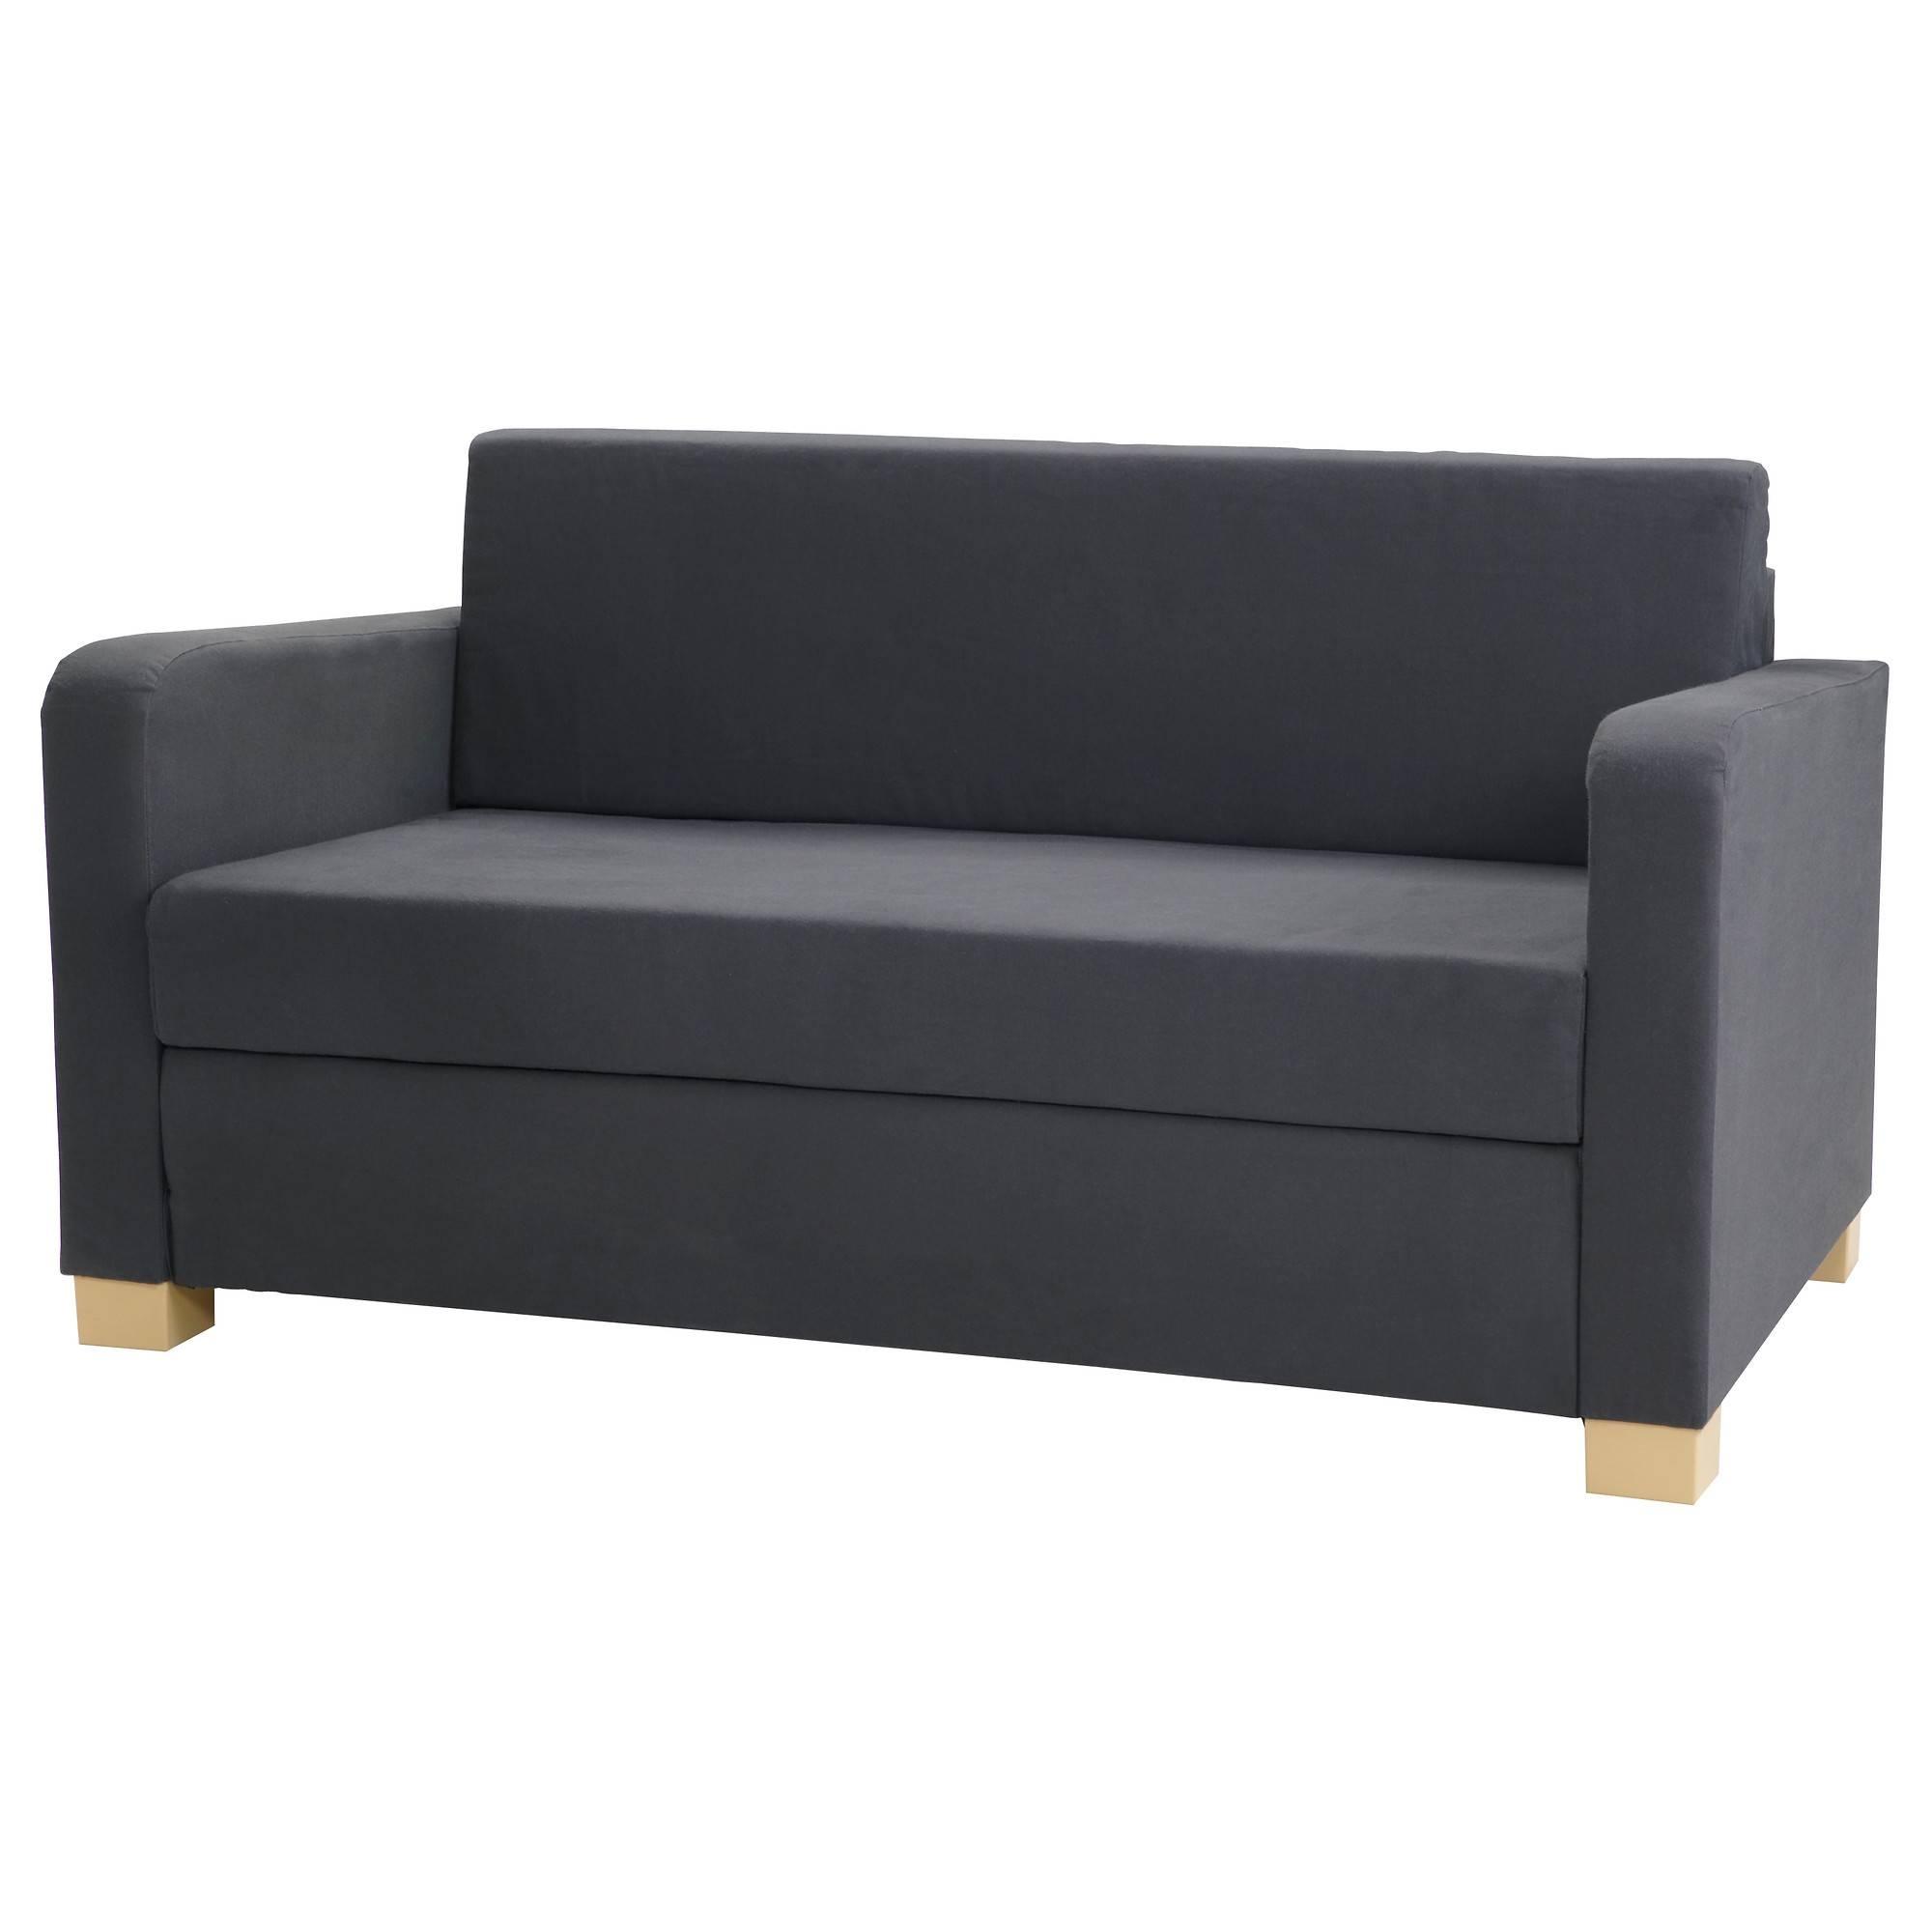 Solsta Sleeper Sofa - Ikea with Euro Sofa Beds (Image 14 of 15)